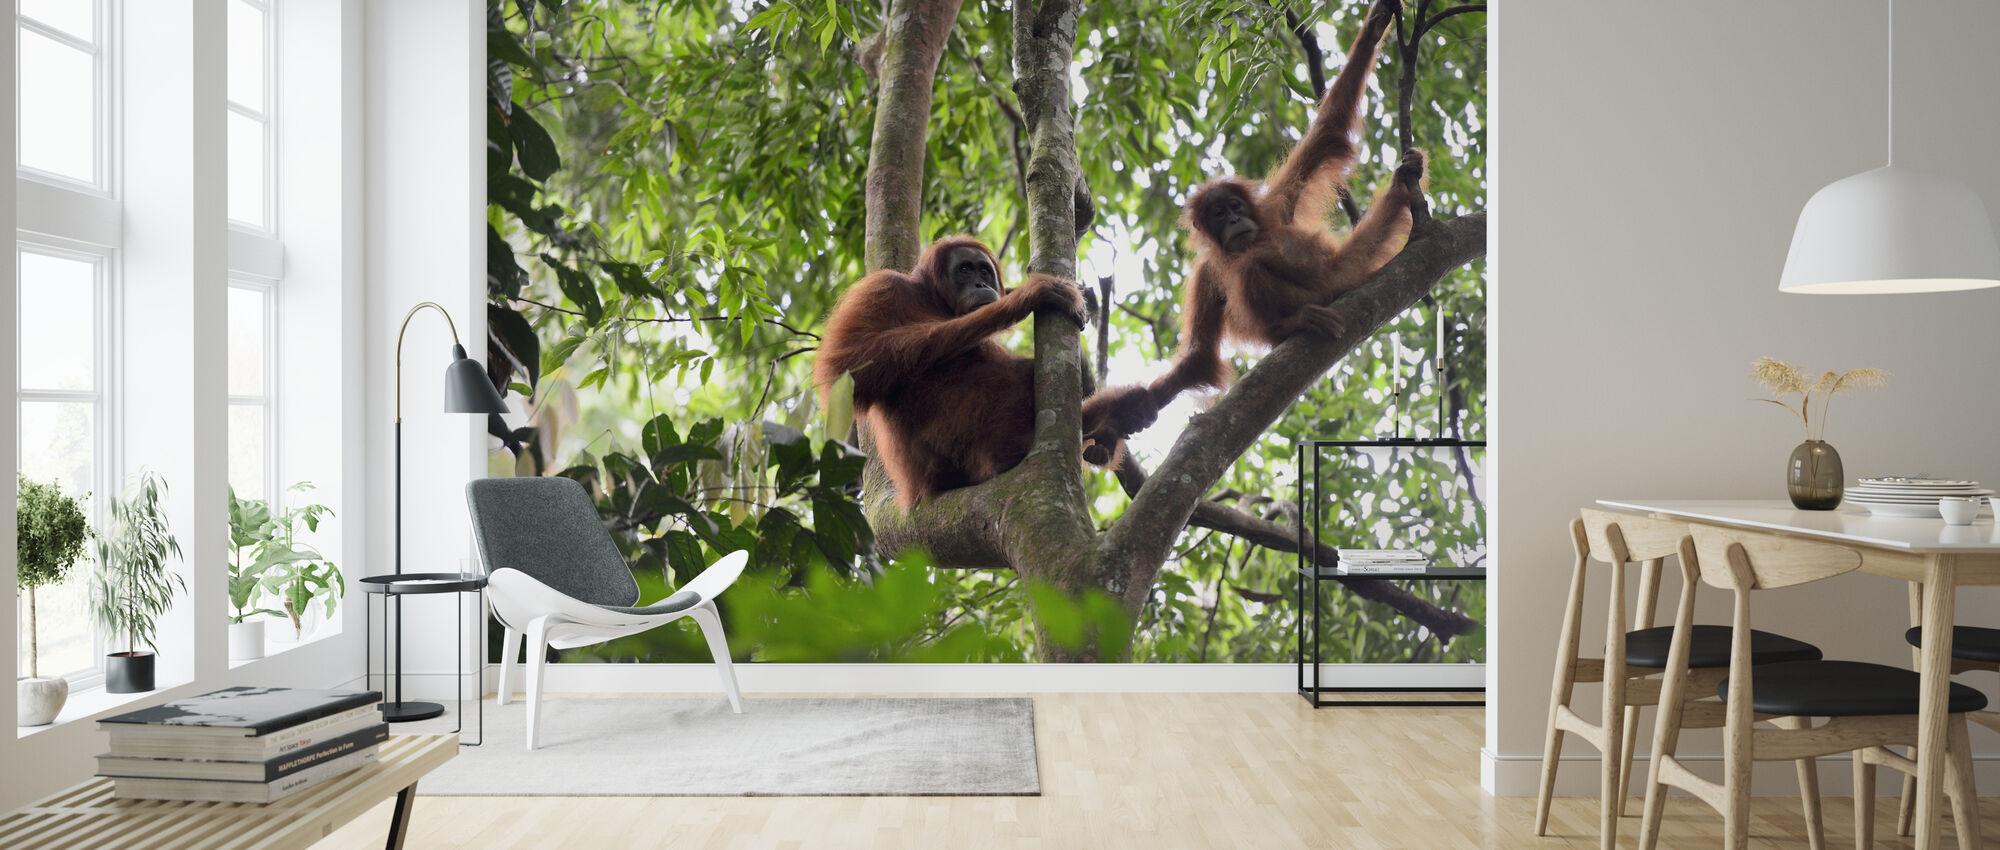 Female and Infant Orangutan - Wallpaper - Living Room